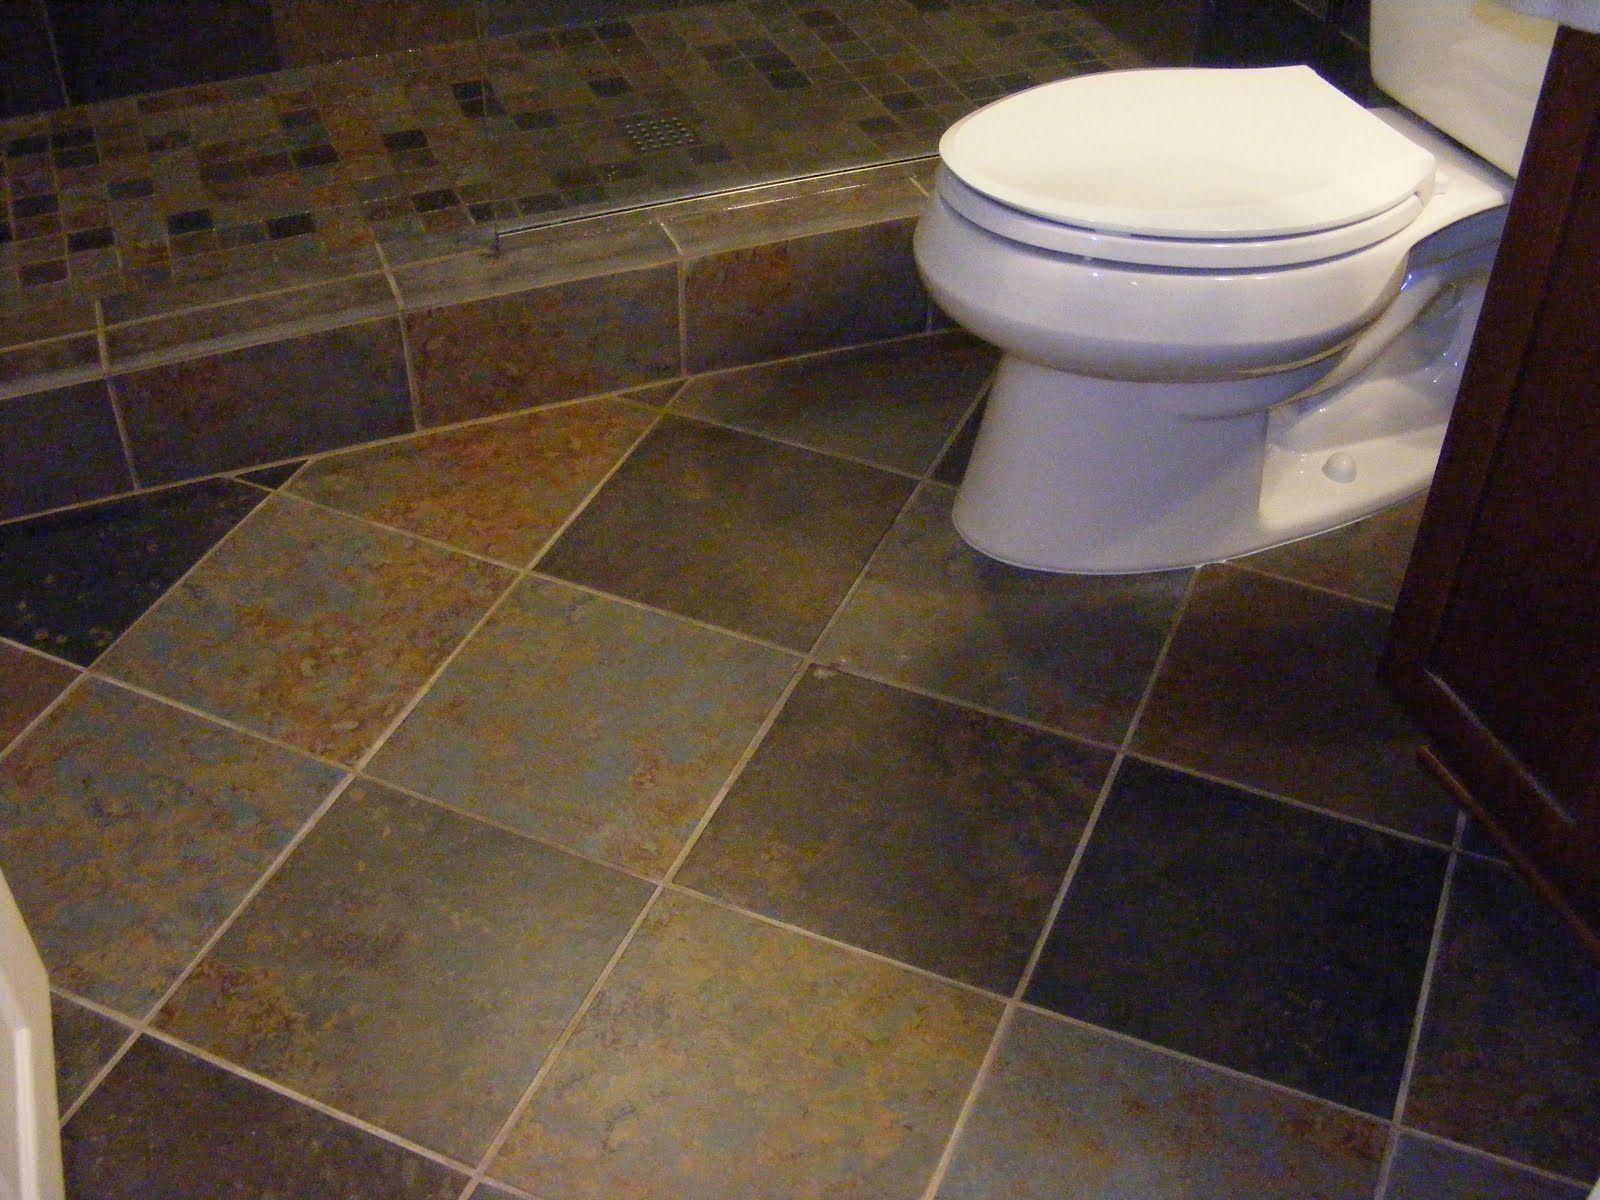 Bathroom Floor Tile Modern Patterns For Bathrooms Octagon Ideas Delectable Ceramic Tile Ideas For Small Bathrooms 2018